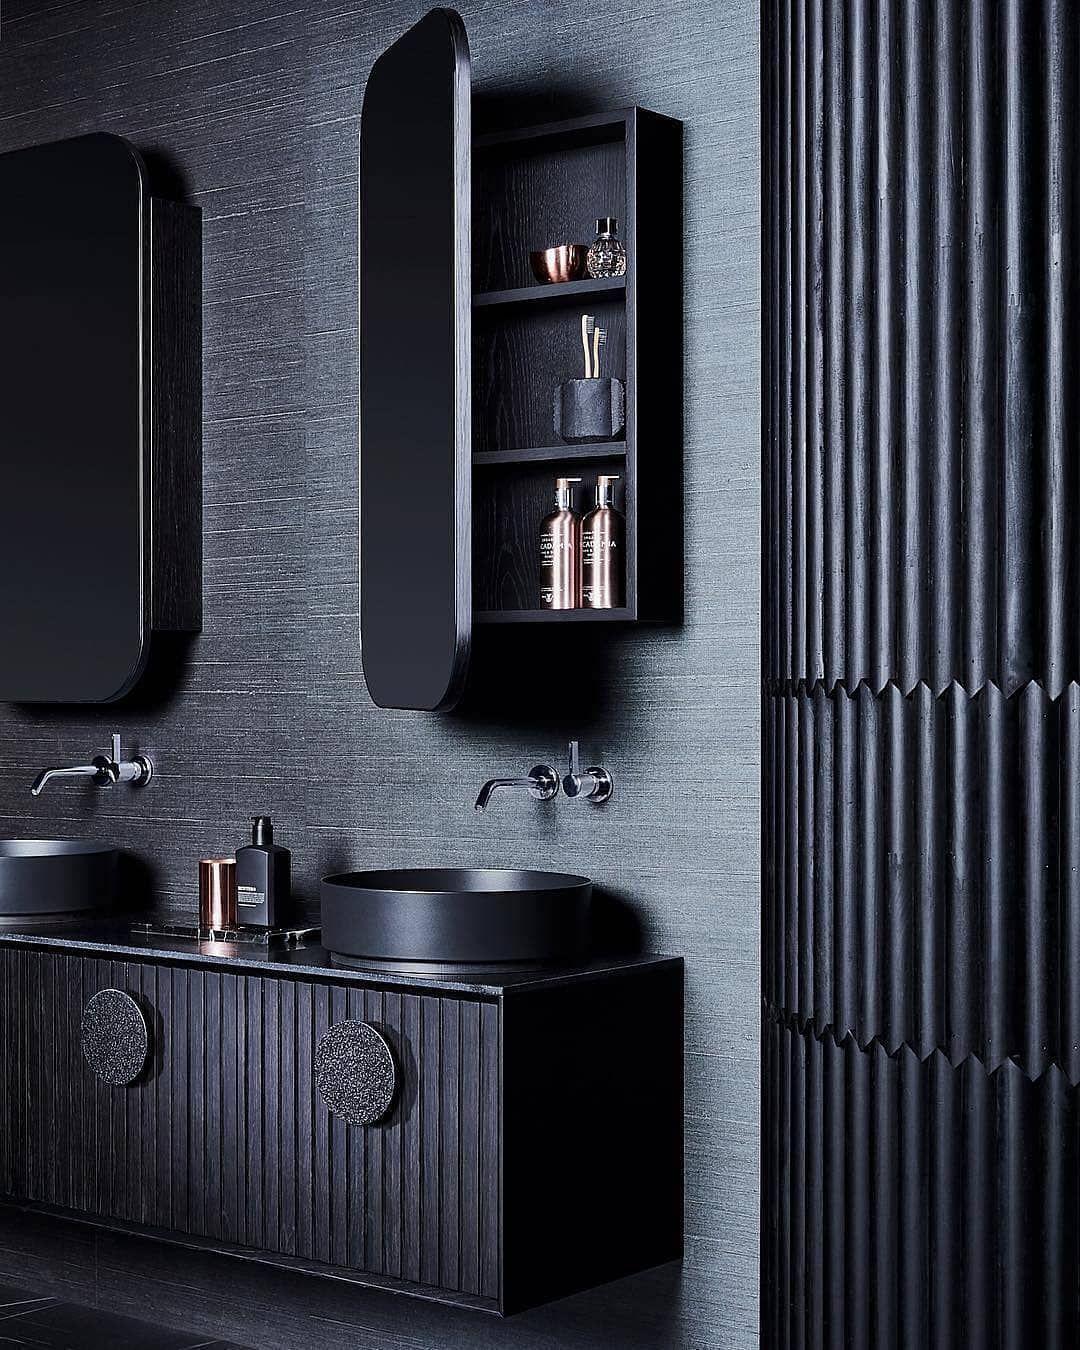 No Need To Do This Custom Purchase Bathroom Vanity Through Cara Co Bathroom Vanity Interiorde Reece Bathroom Bathroom Vanity Bathroom Furniture Modern